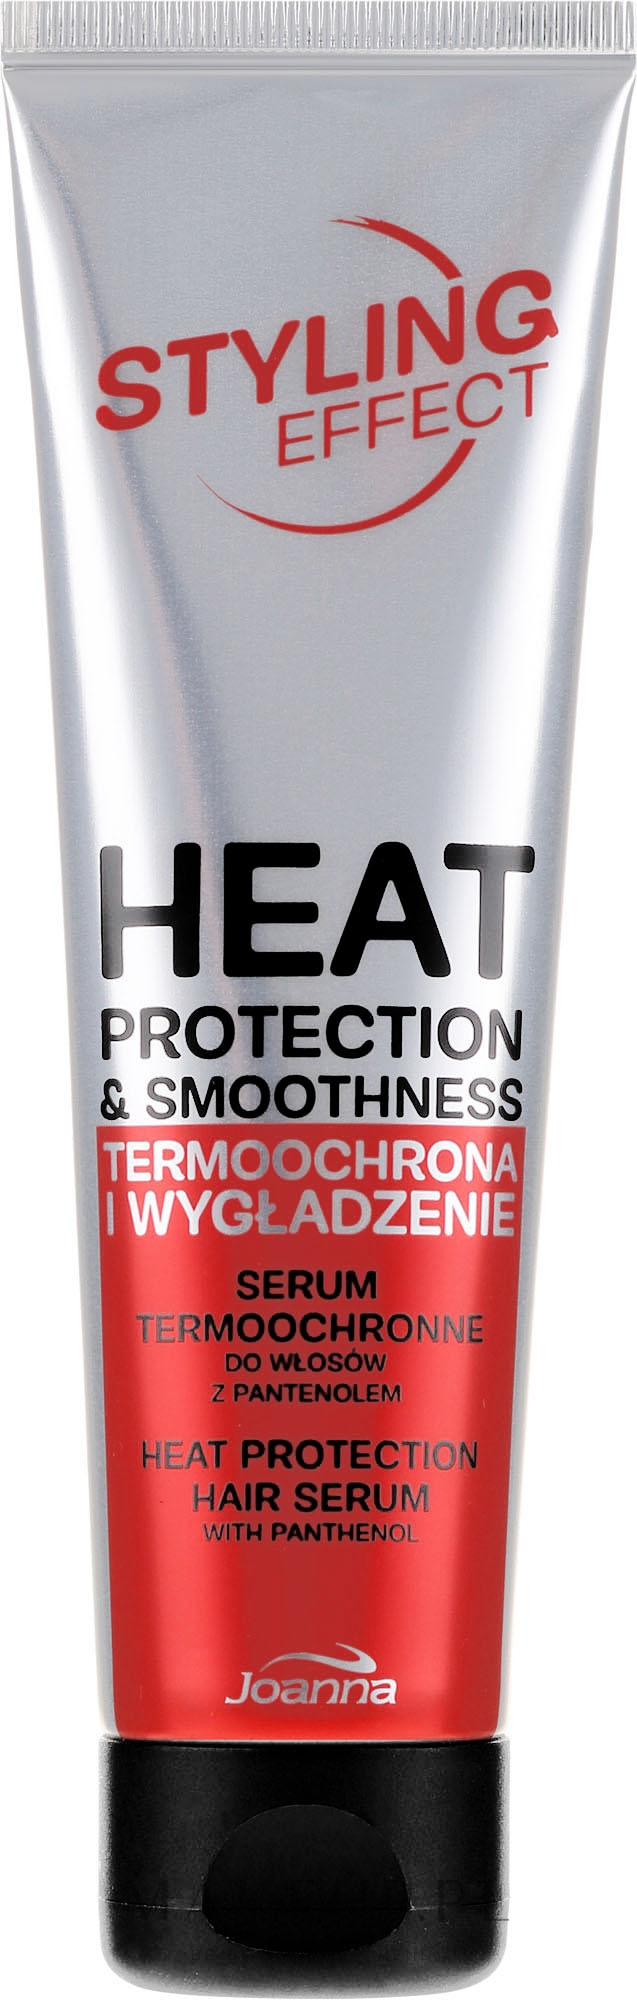 Serum termoochronne do włosów - Joanna Styling Effect Heat Protection Serum — фото 100 g